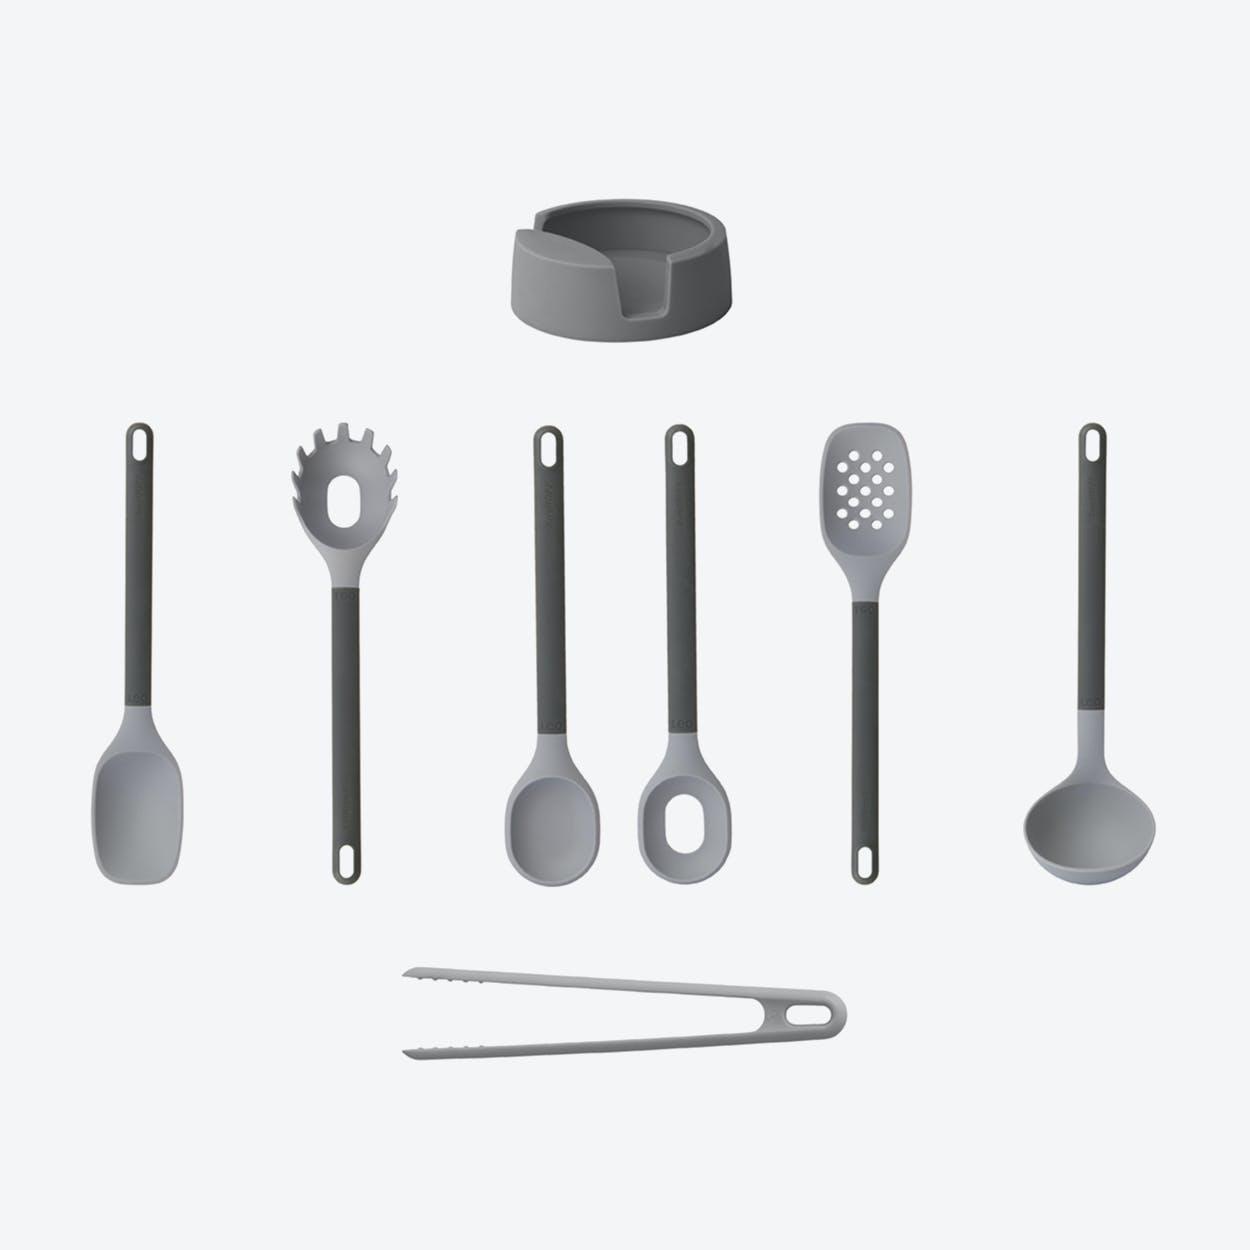 Serving Accessories Set 1